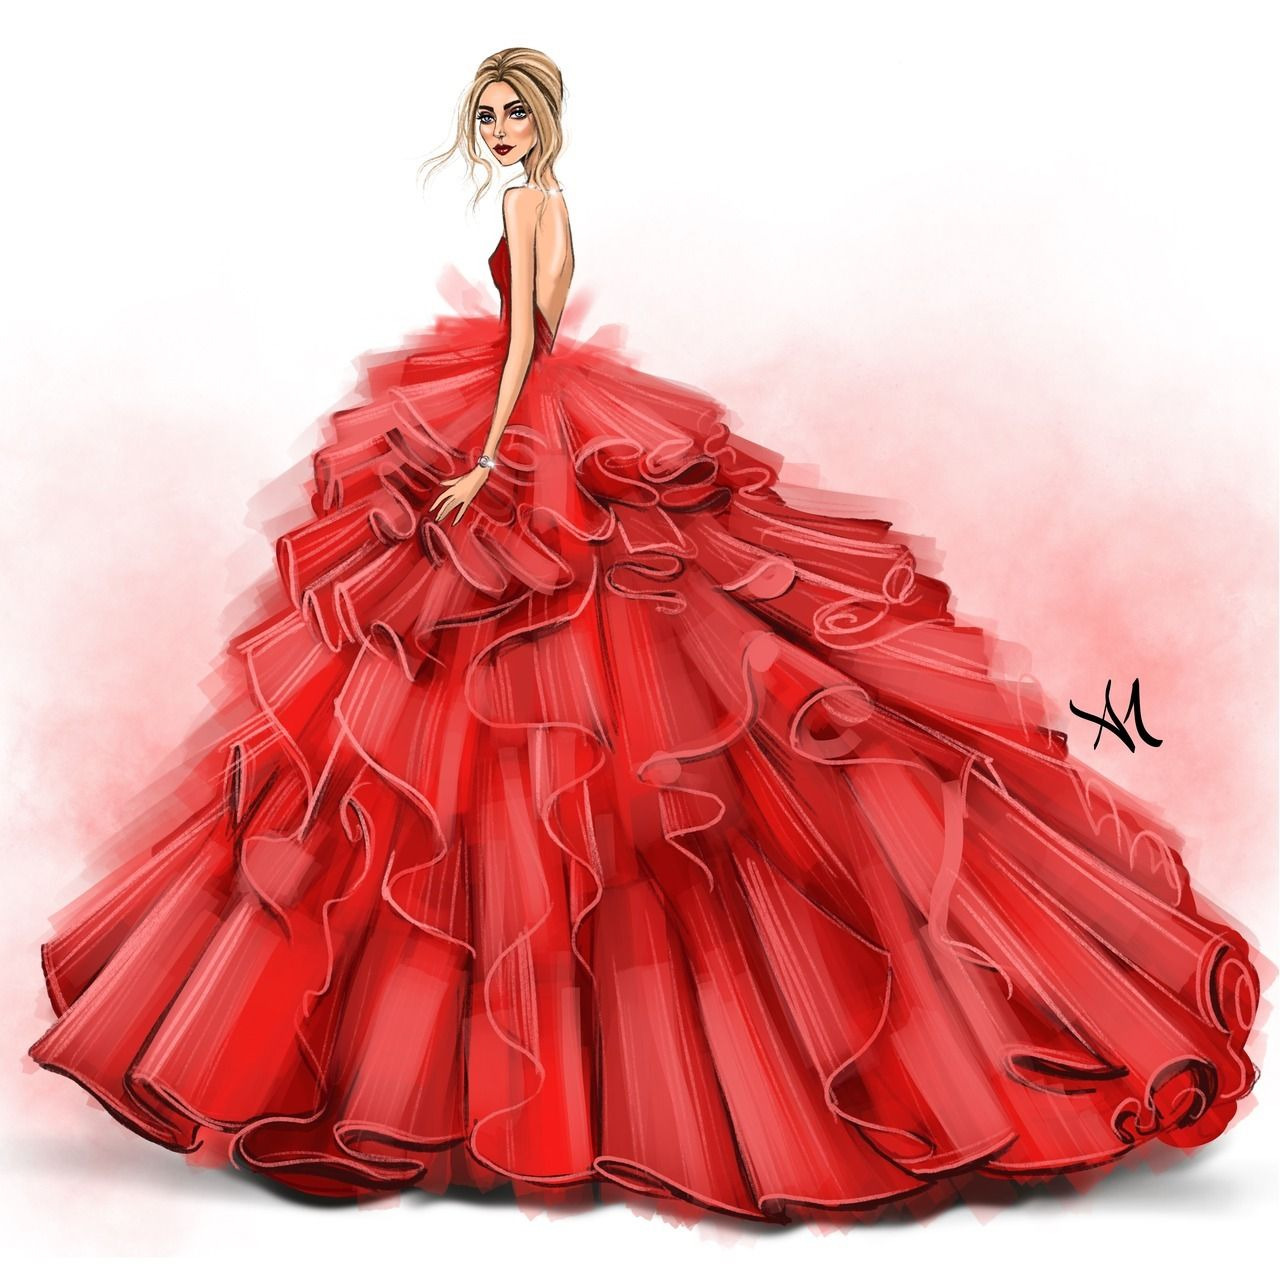 Chiara Ferragni By Armand Mehidri Https Www Instagram Com P Bqflz8eanm4 Fashion Design Dress Dress Design Sketches Dress Illustration